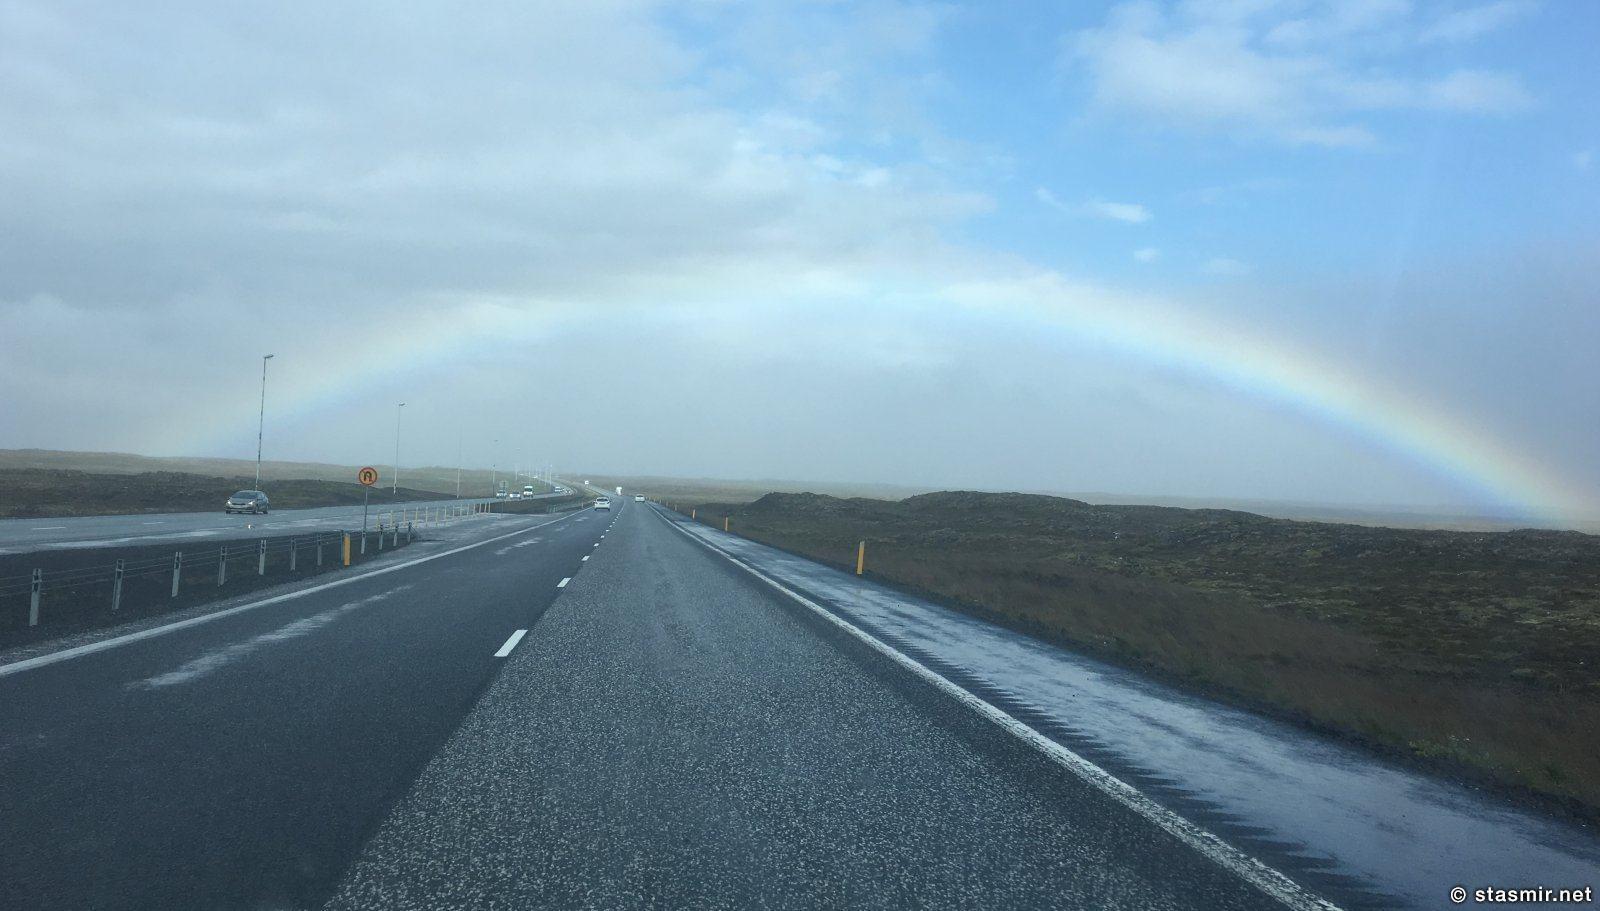 reykjanesbraut - дорого номер 41, на которой зарегистрировано большинство нарушений скорости, Фото Стасмир, photo Stasmir